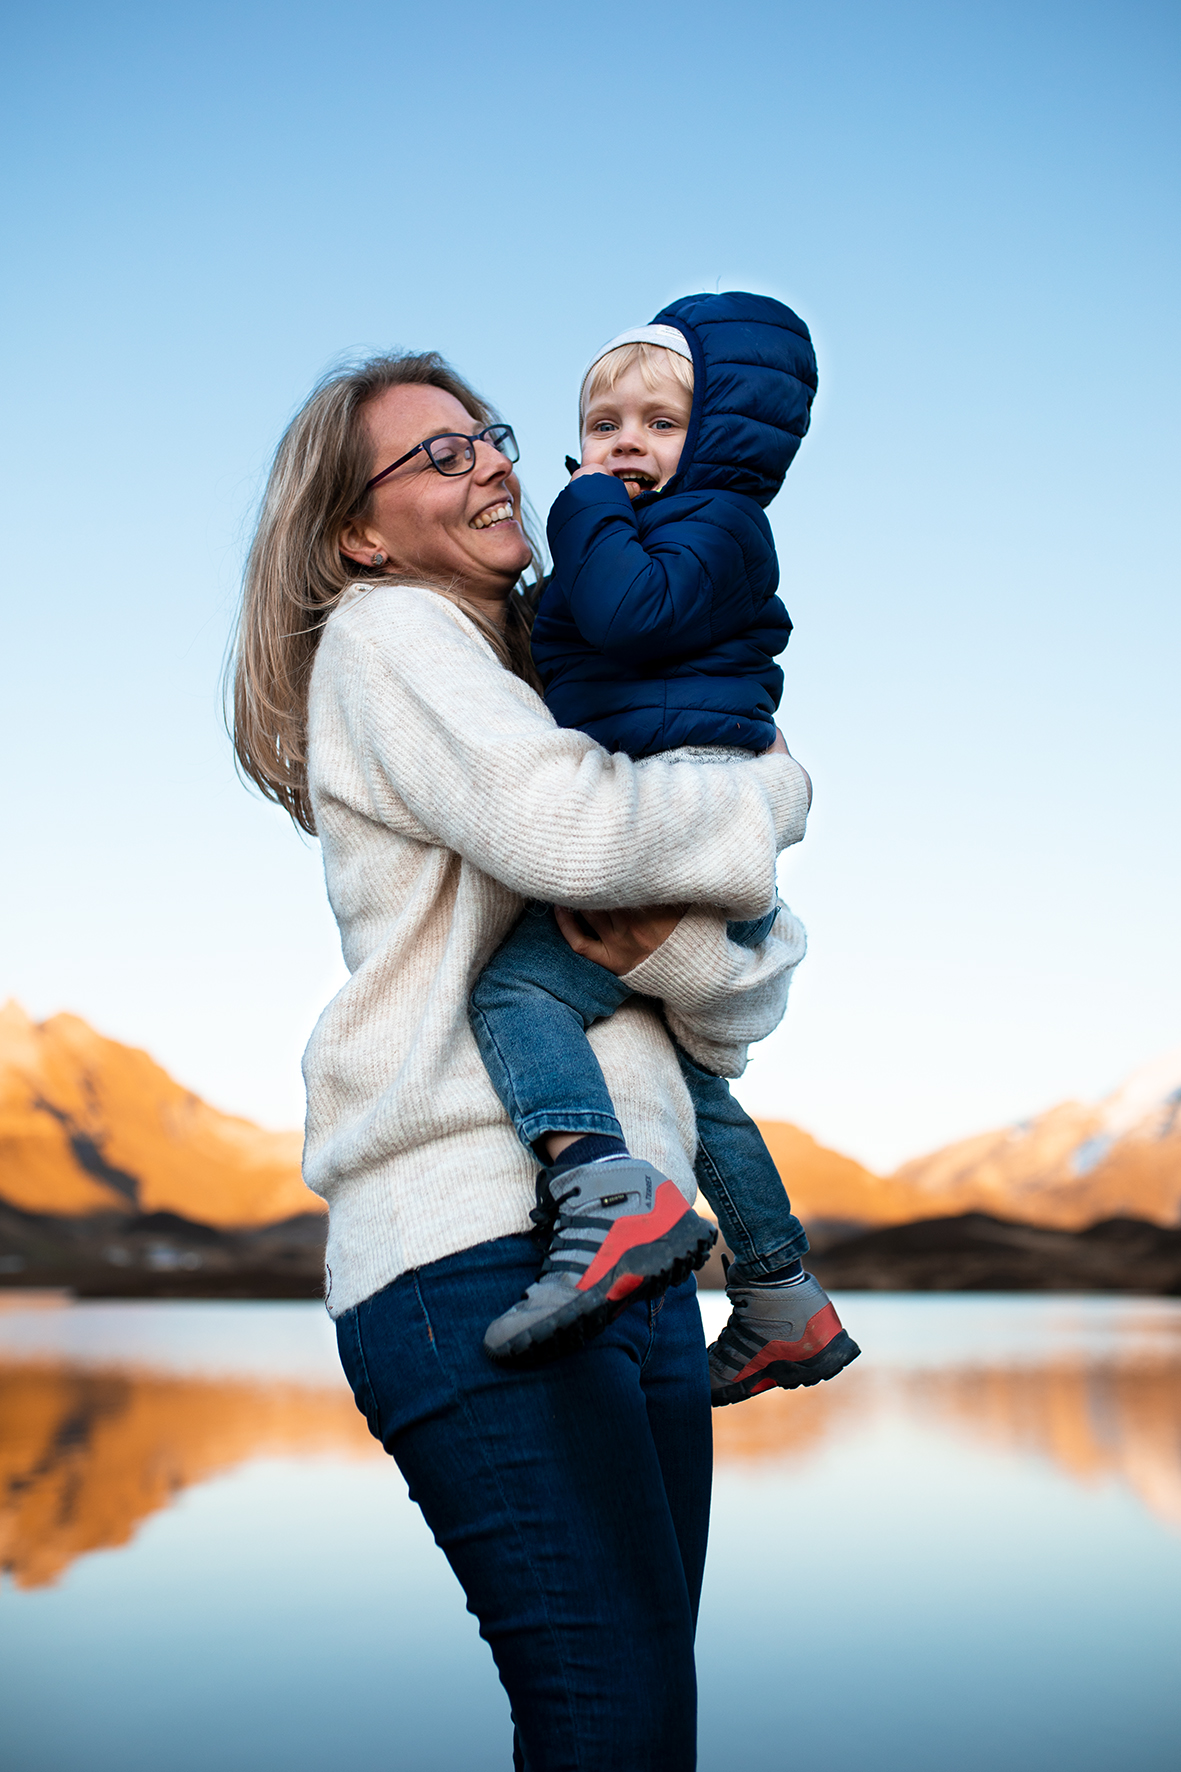 Familienshooting_Familienfotografie_Luzern_Schweiz_32